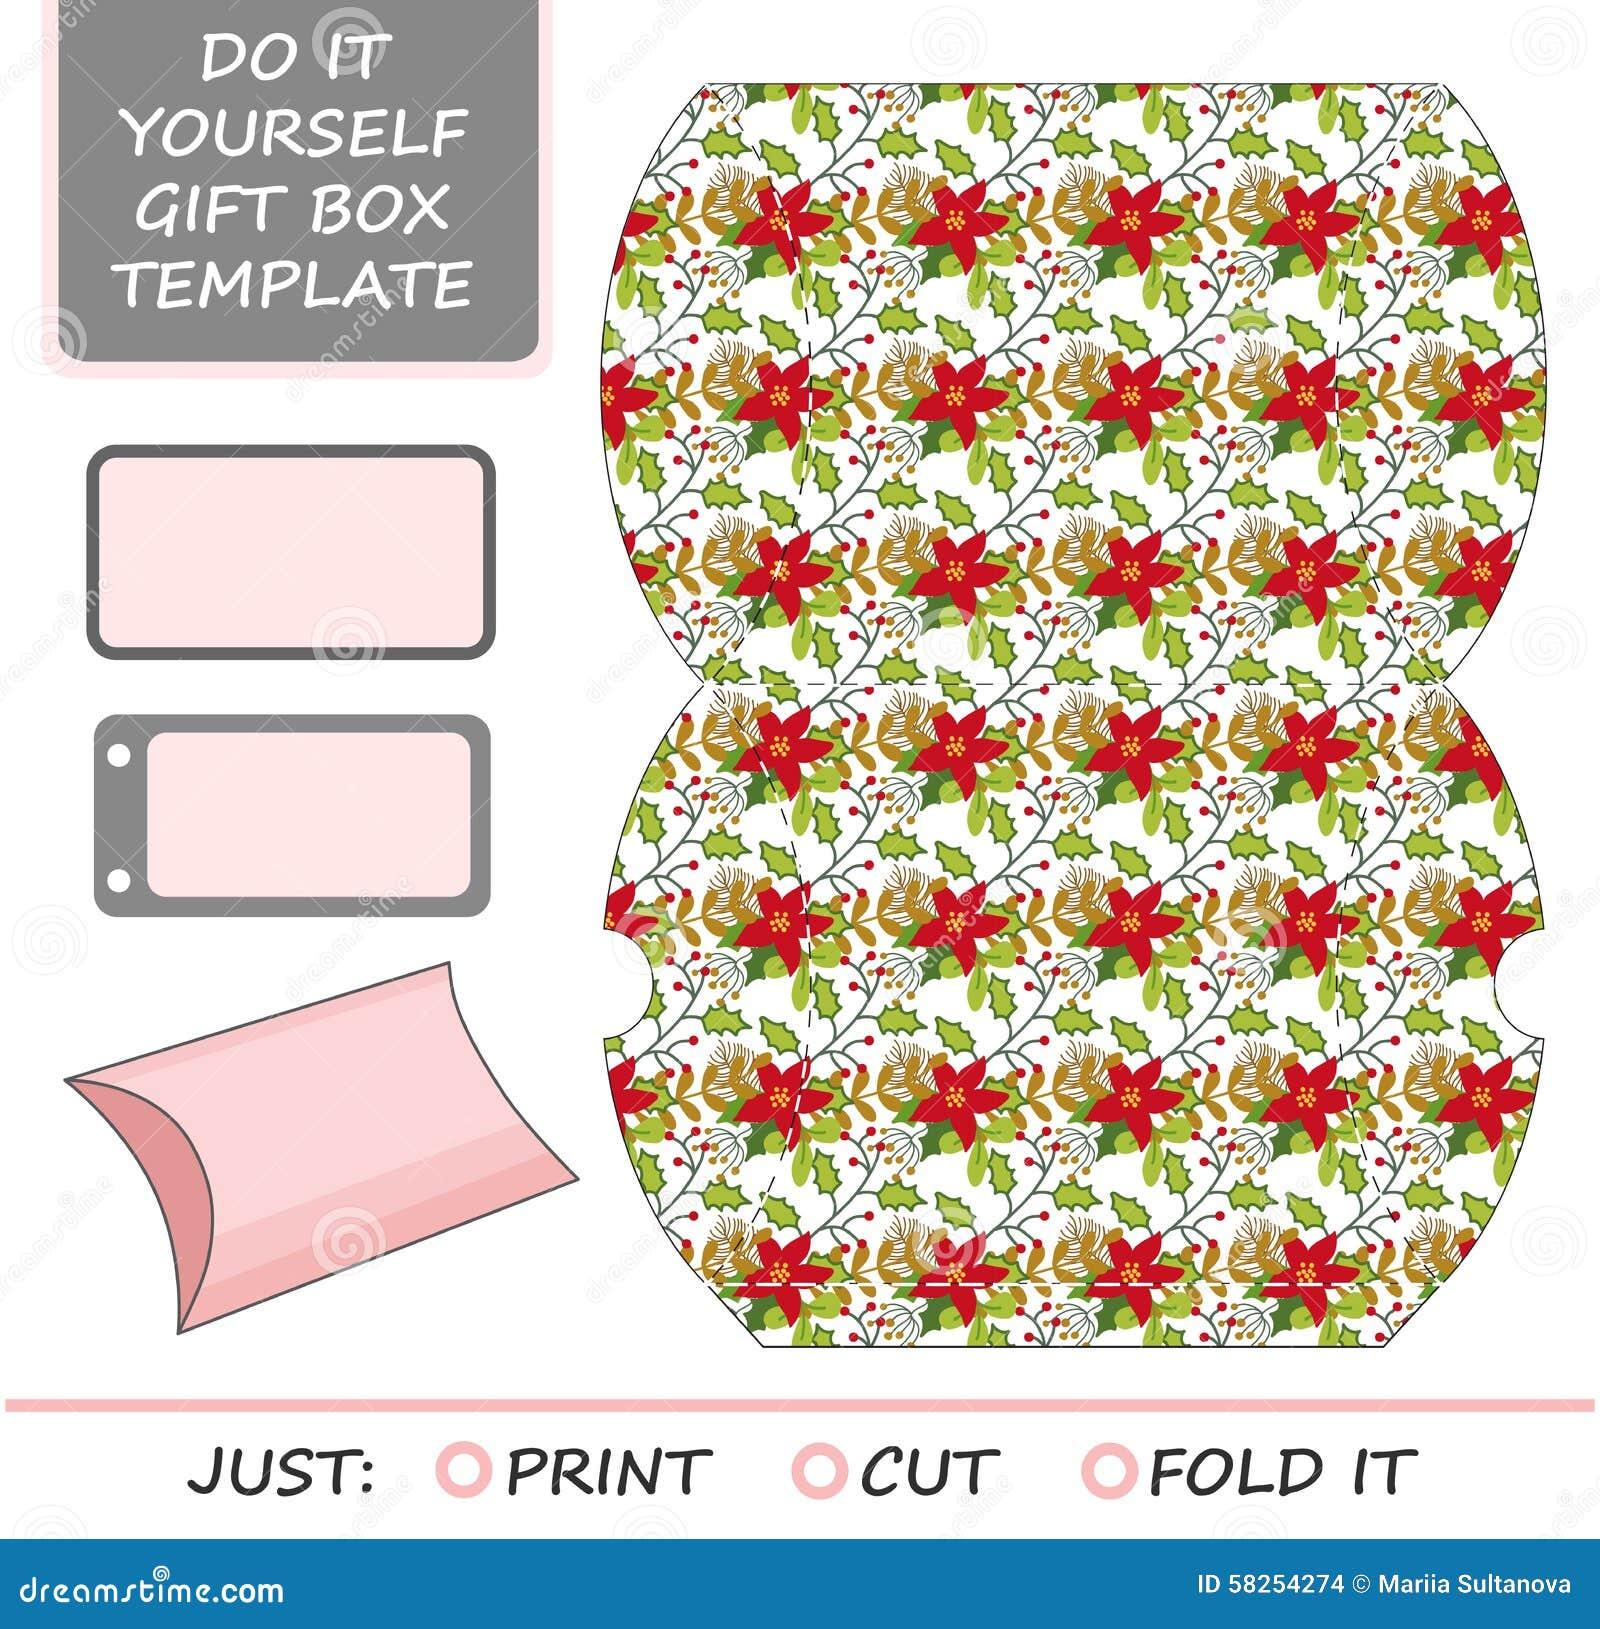 favor gift box die cut box template stock vector image  favor gift box die cut box template